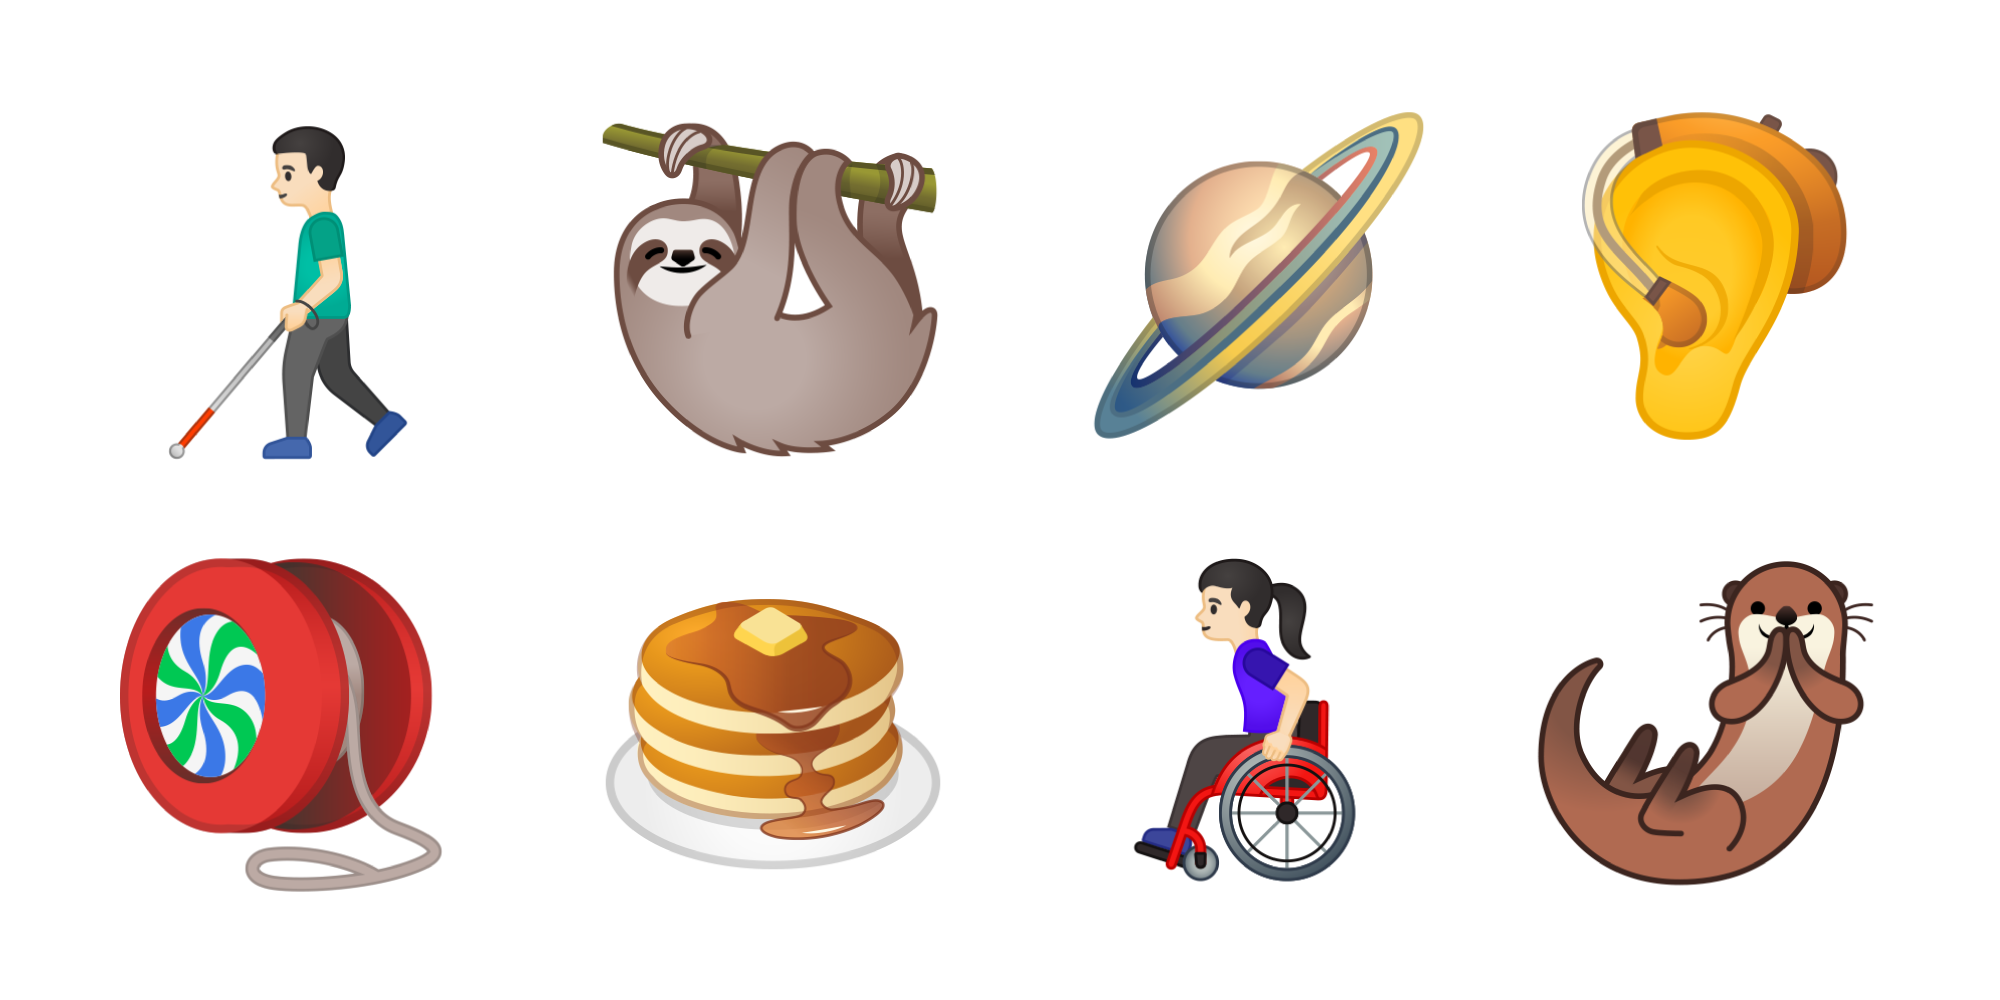 io19_designguide_inline_emoji_B_v1.png